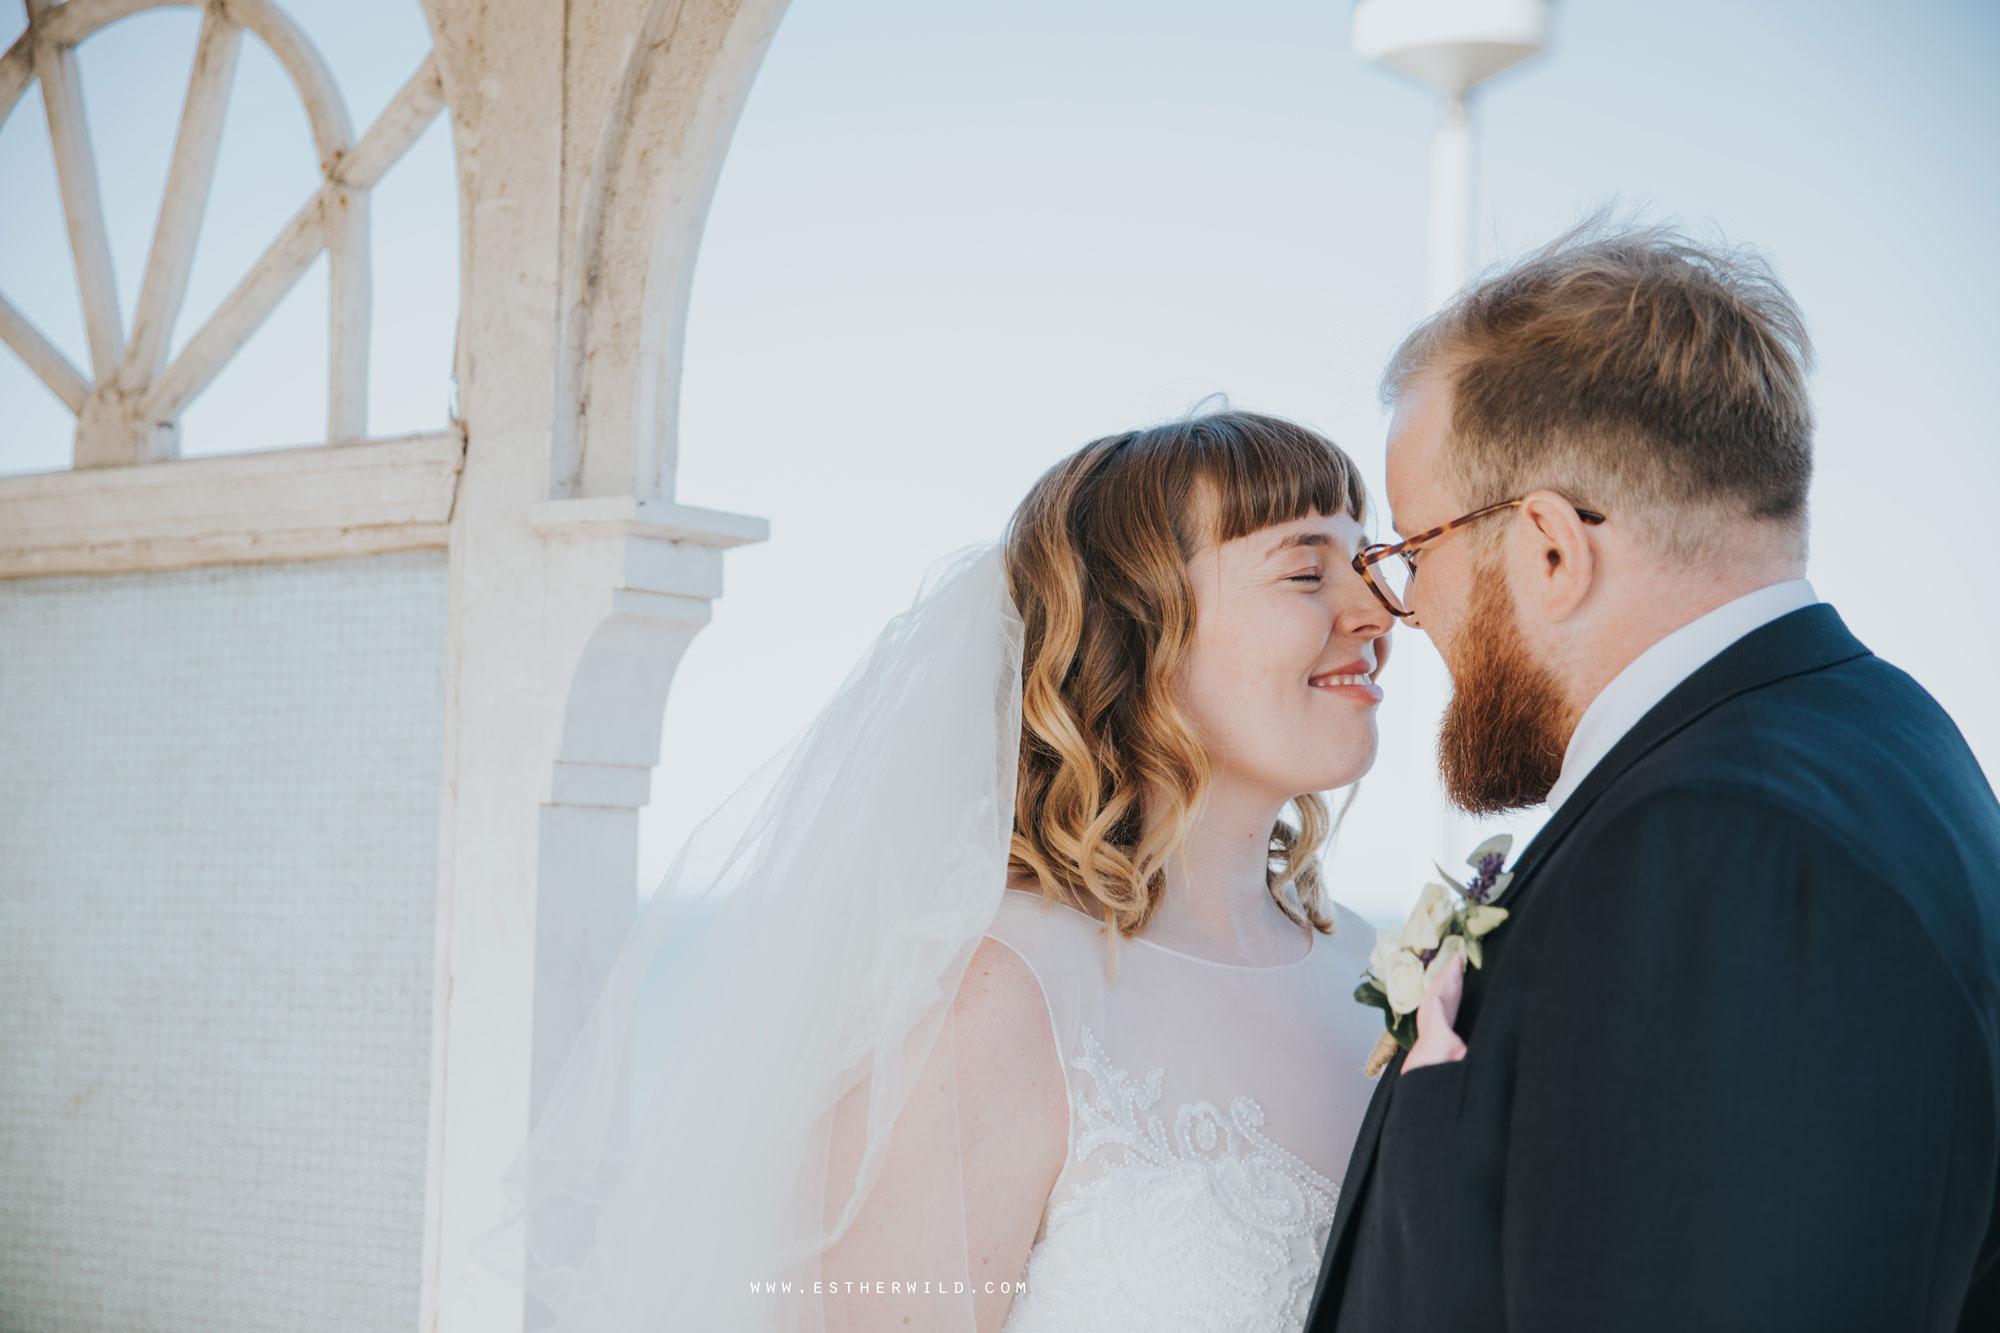 Cromer_Wedding_Beach_Outdoor_Ceremony_Norfolk_North_Lodge_Registry_Office_Rocket_House_Cafe_Cromer_Pier_IMG_4502.jpg